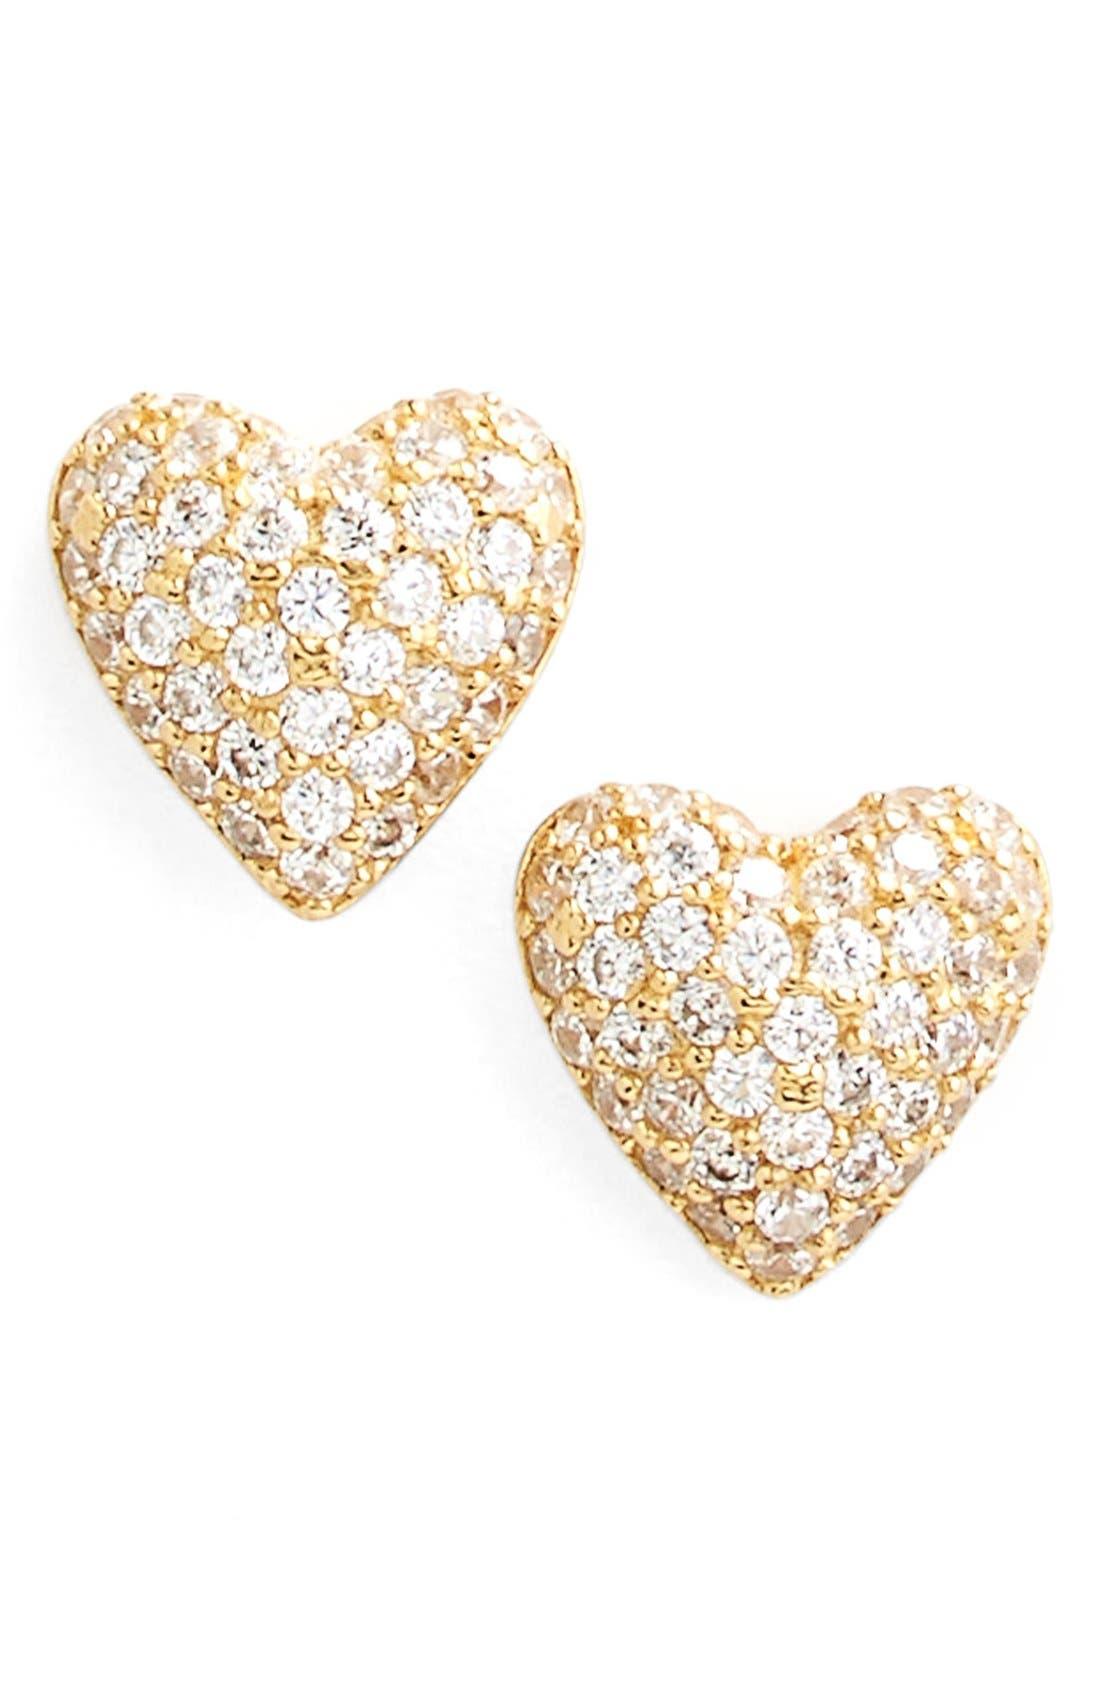 Alternate Image 1 Selected - Nadri 'Valentine's Day' Heart Stud Earrings